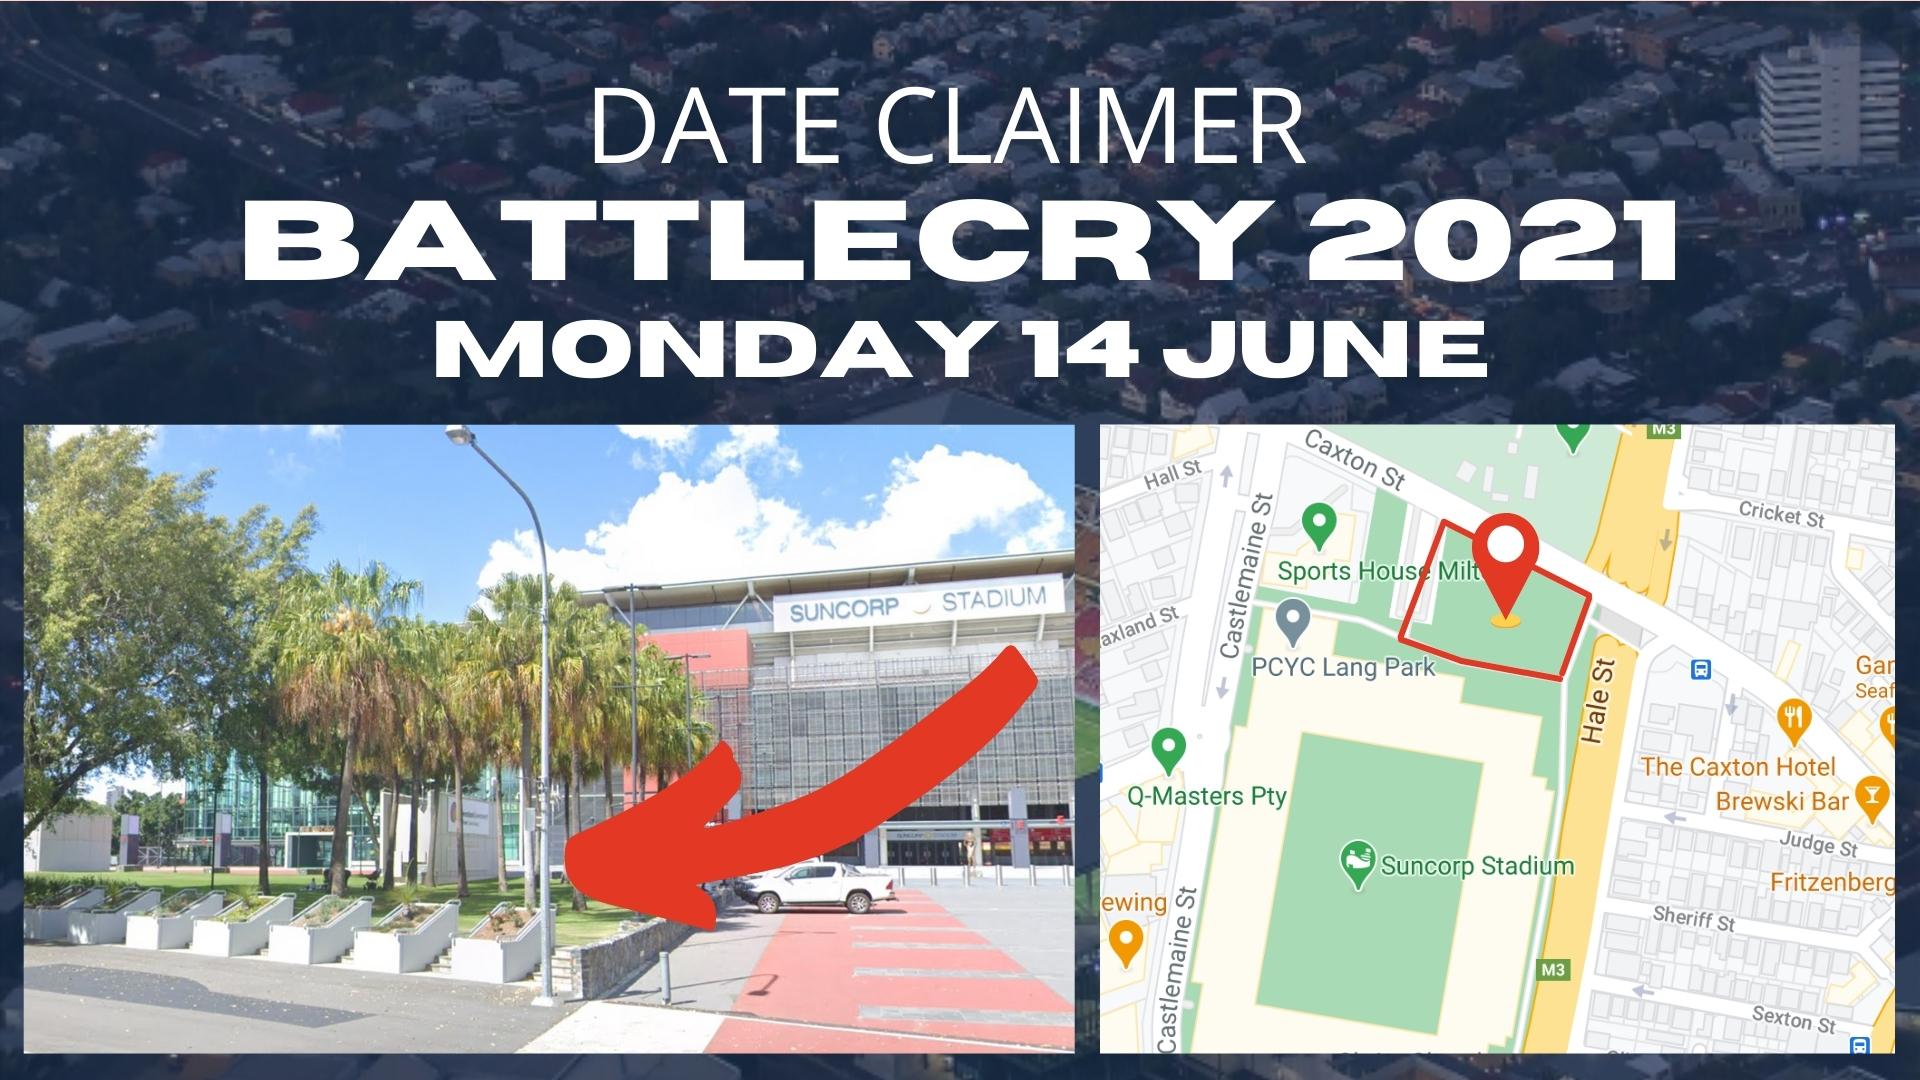 Battlecry 2021